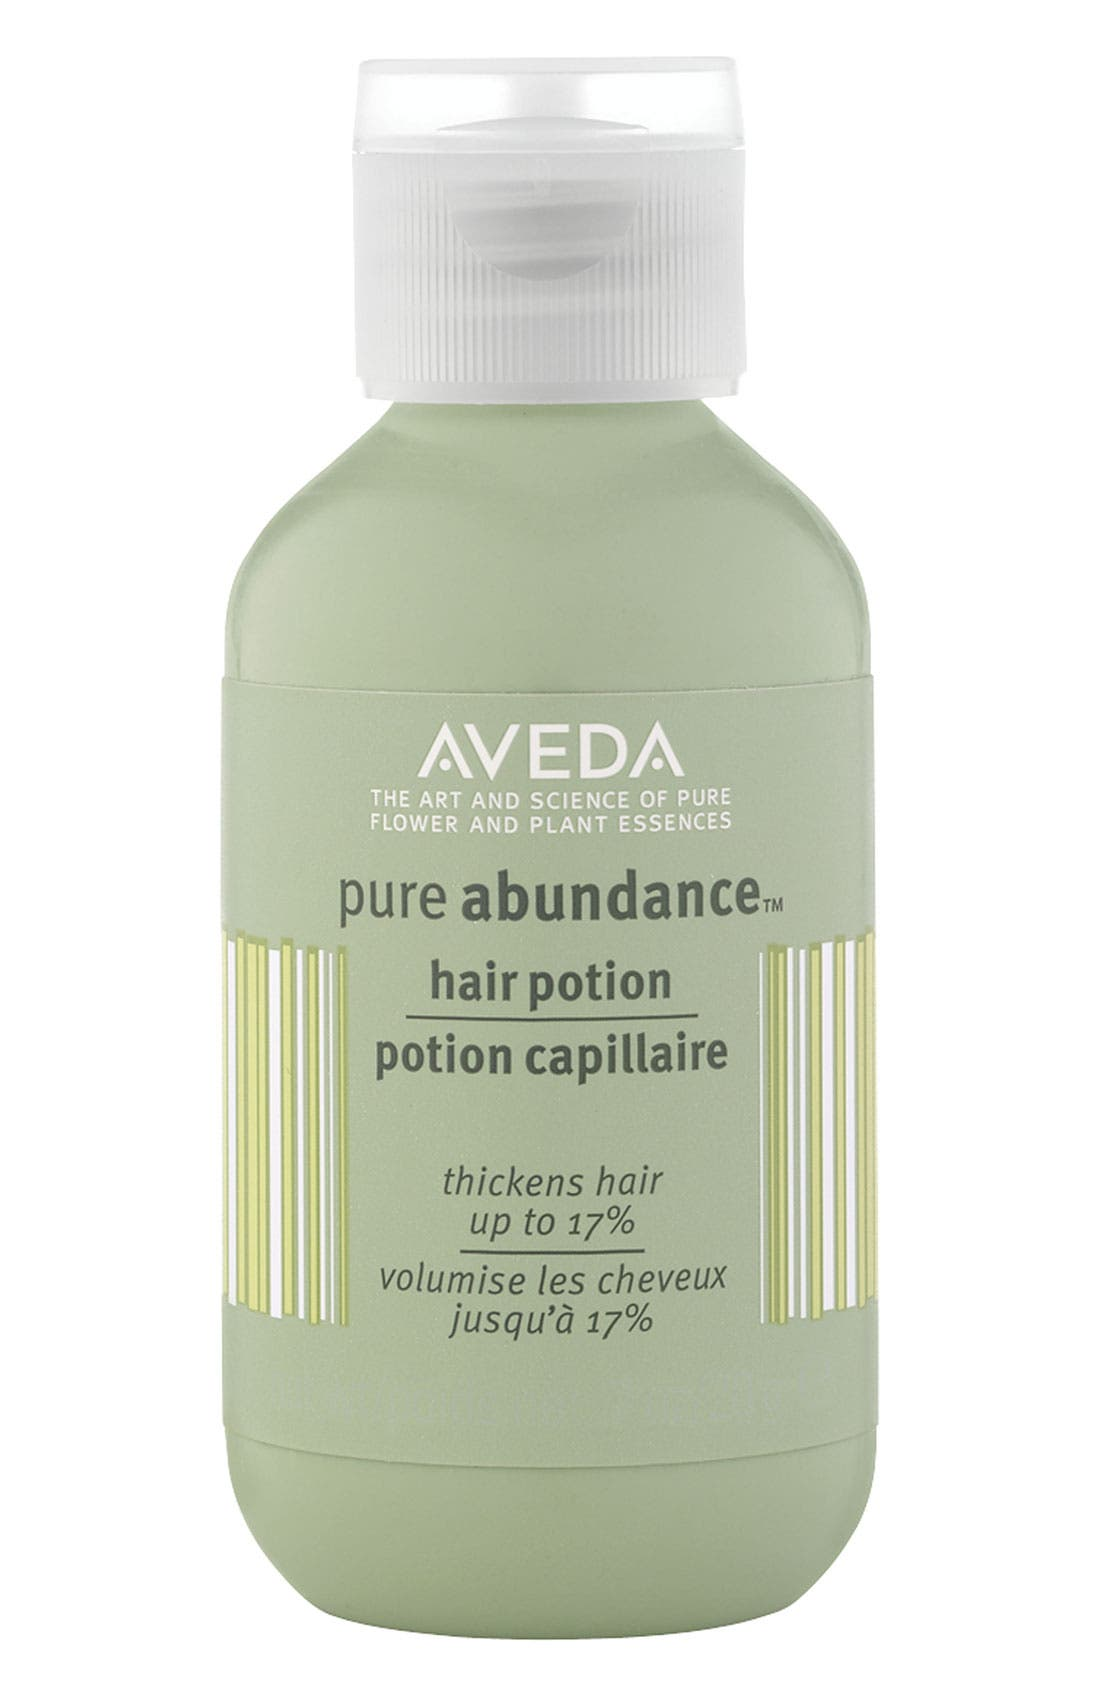 Aveda 'pure abundance™' Hair Potion